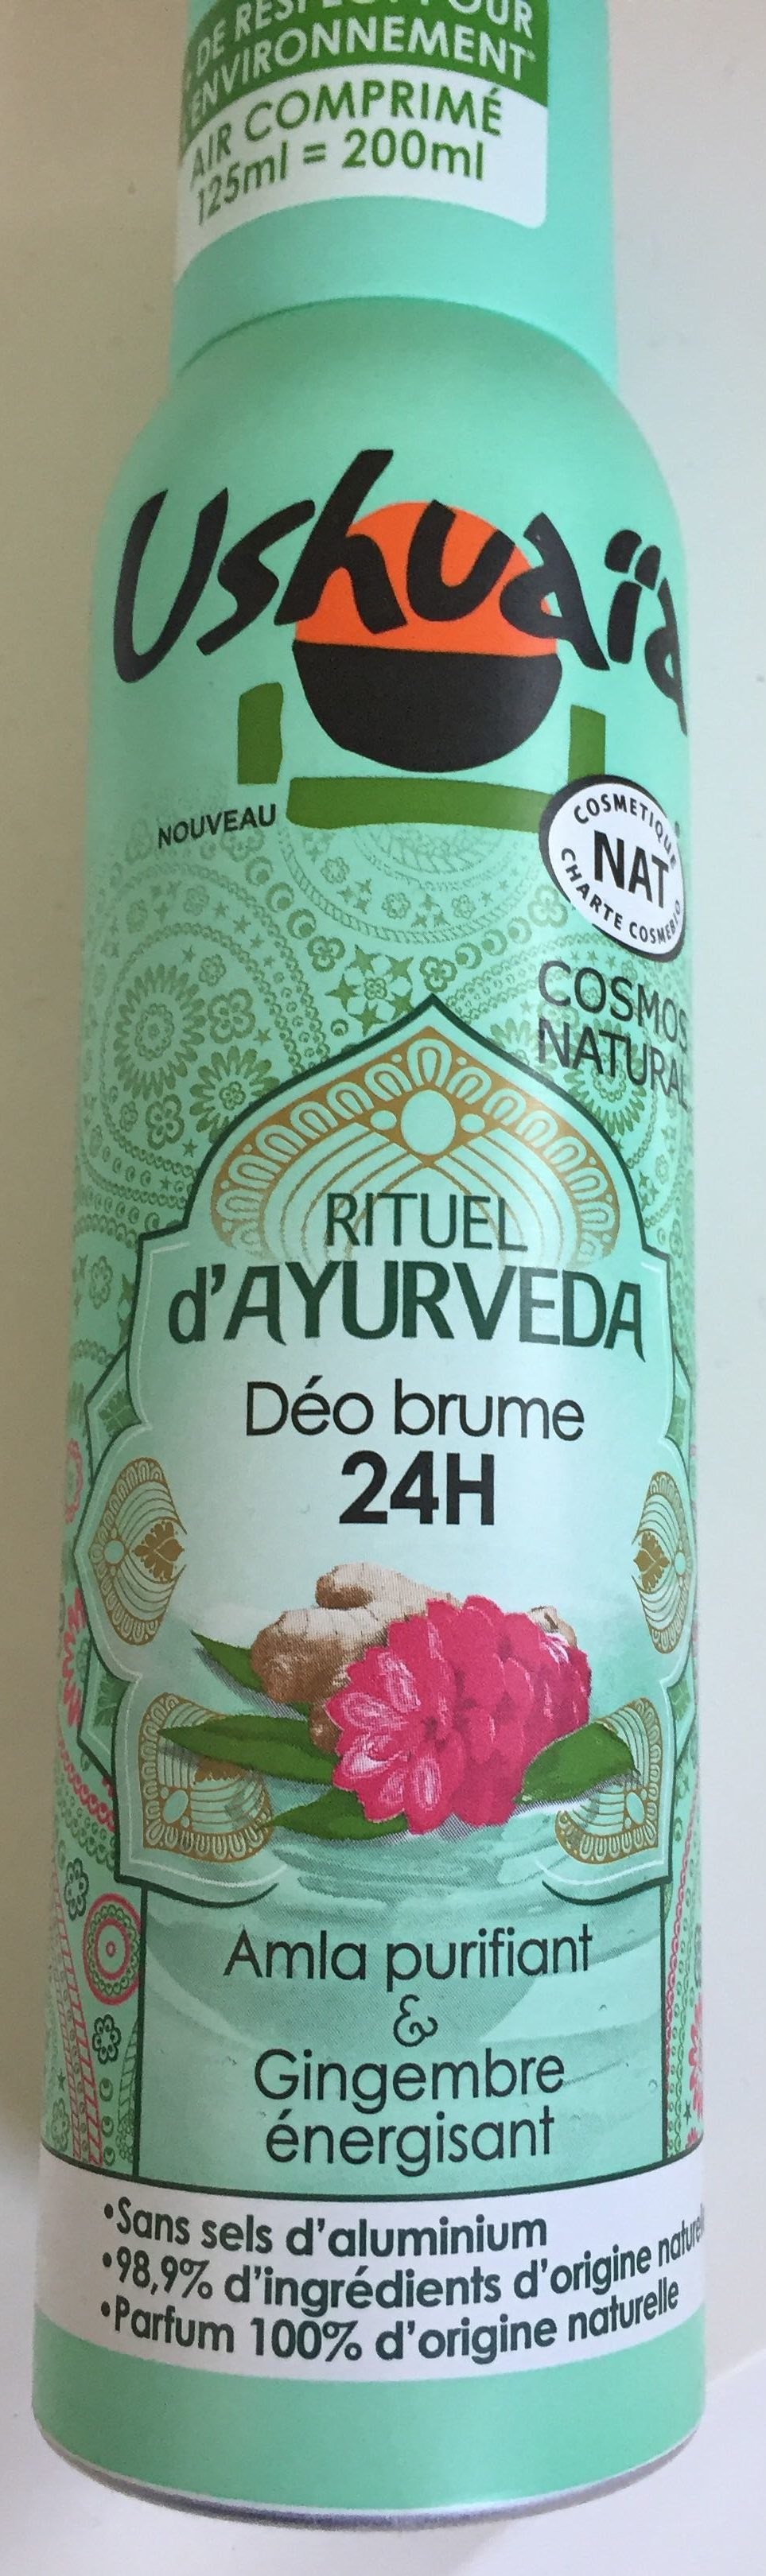 Rituel d'Ayurveda - Product